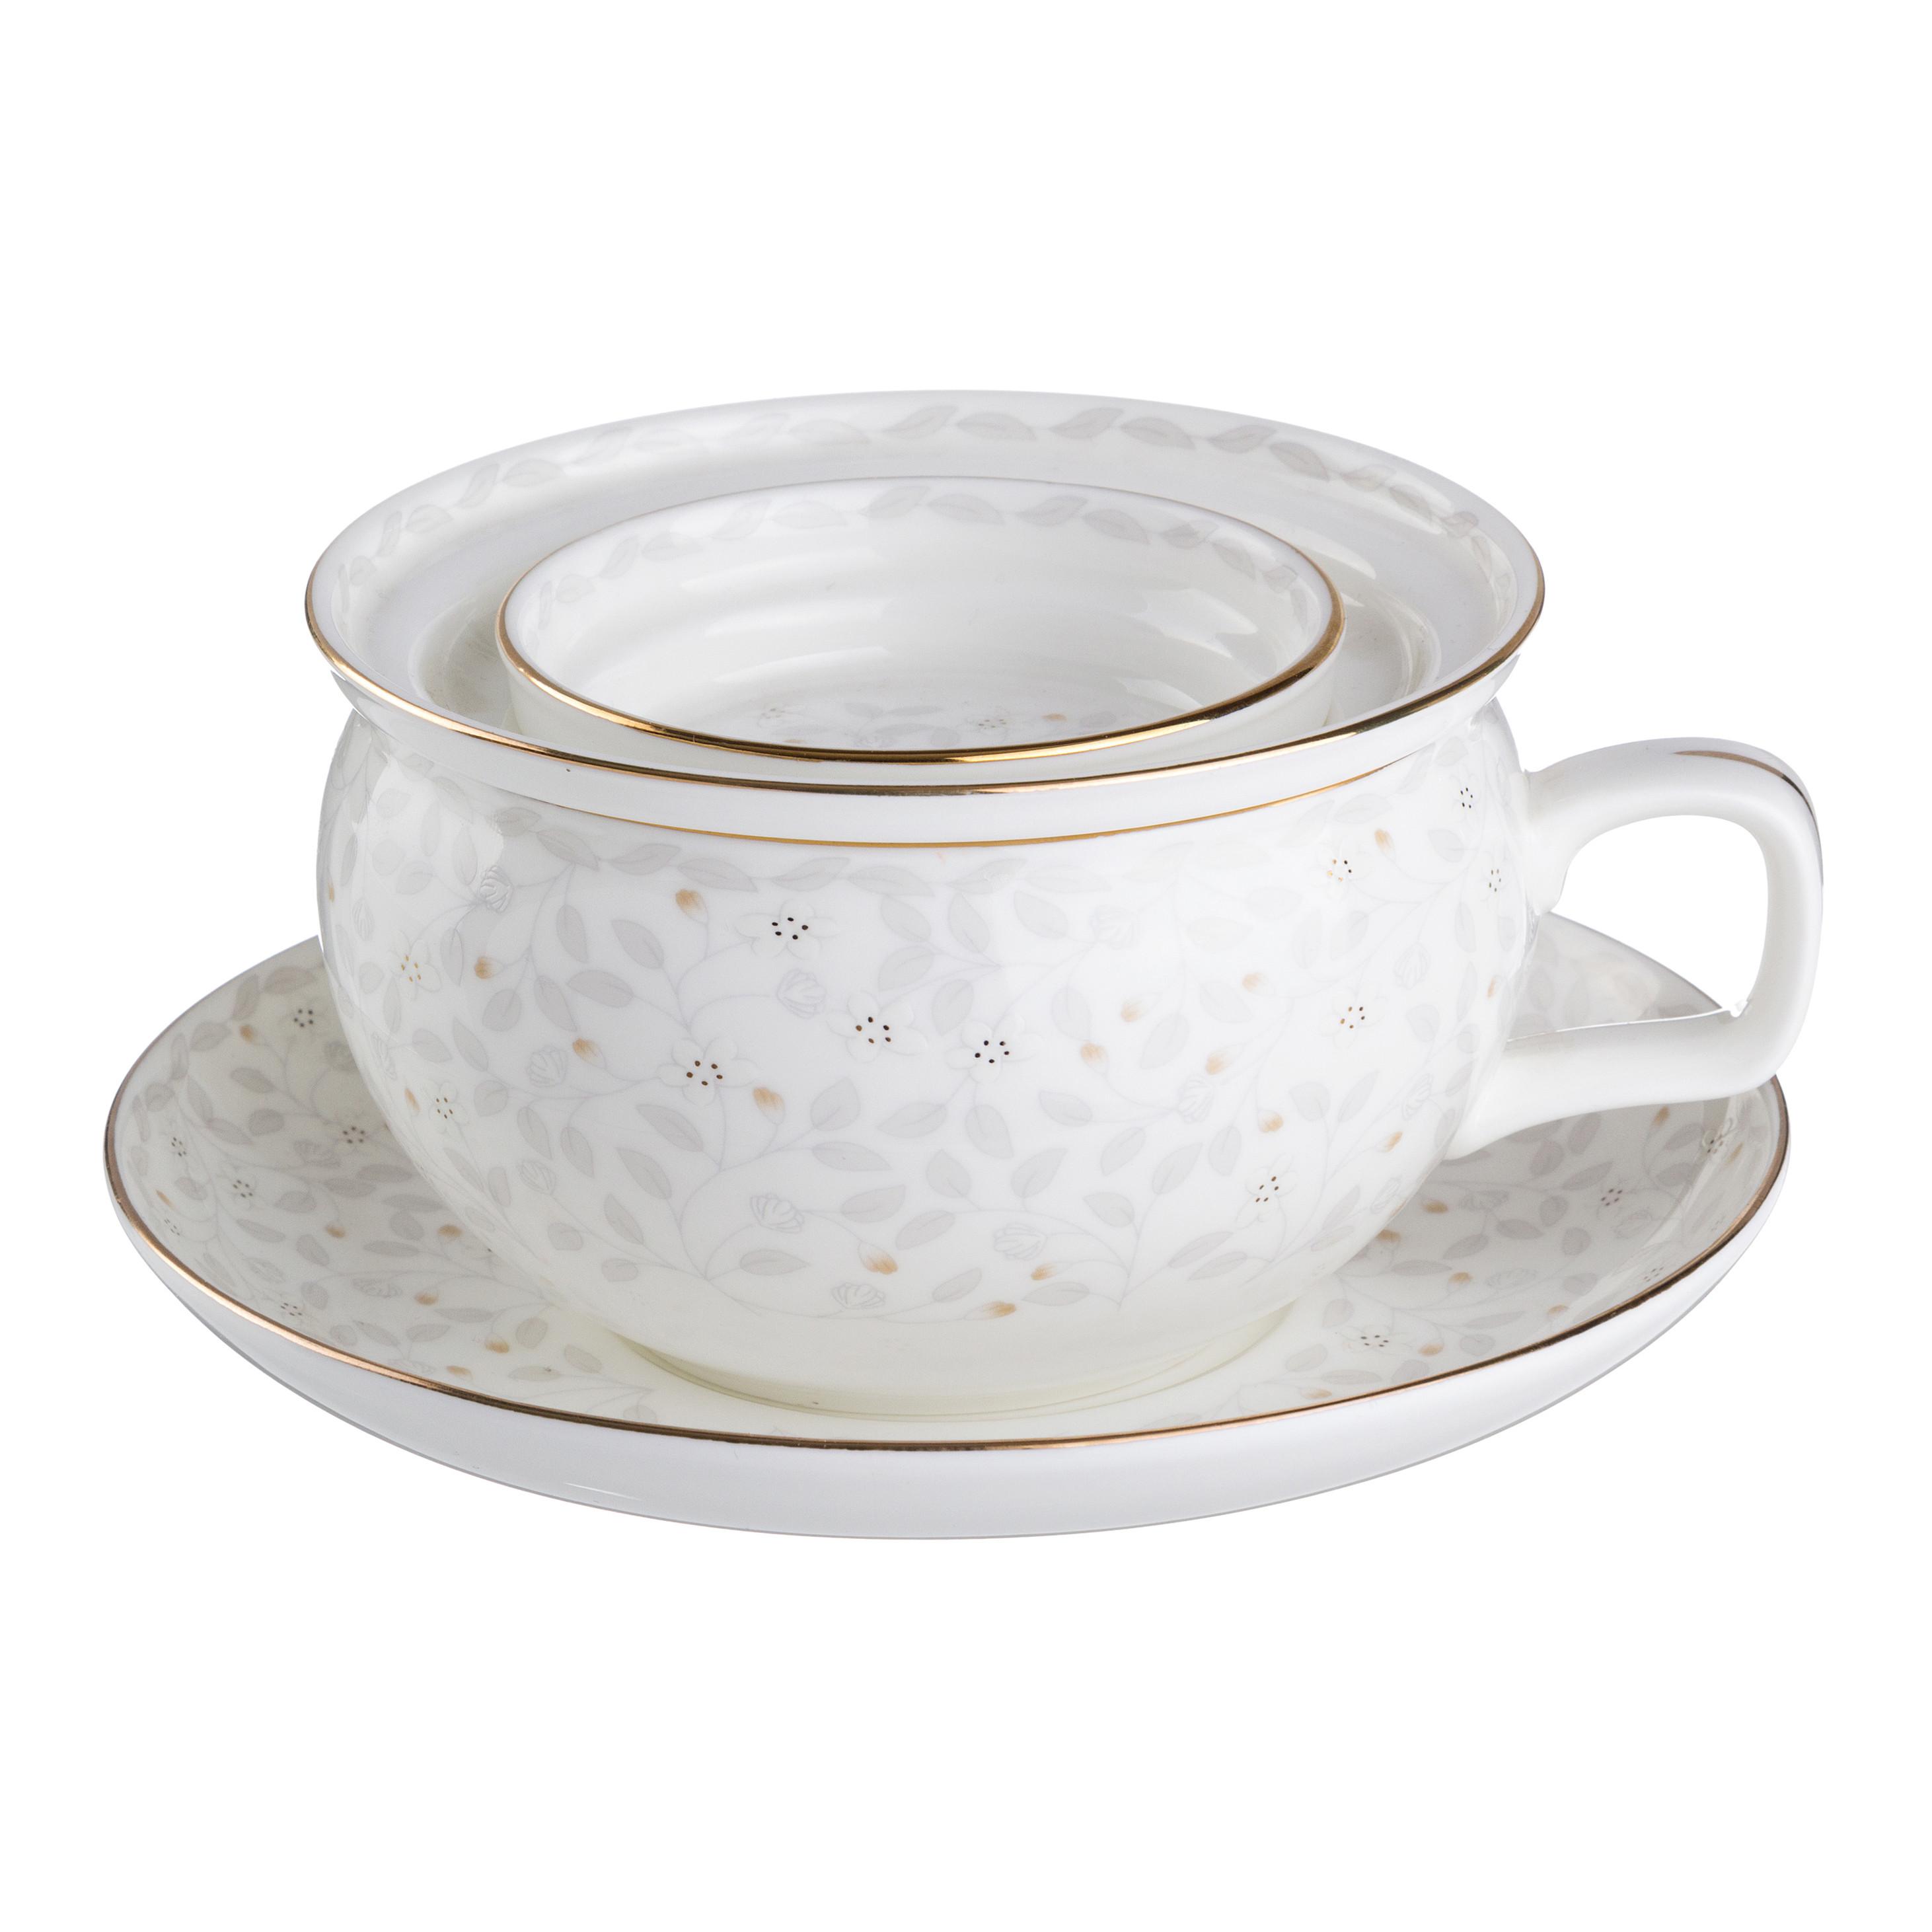 {} Lefard Чайная пара Micah  (450 мл) наборы для чаепития lefard чайная пара венская классика 230мл